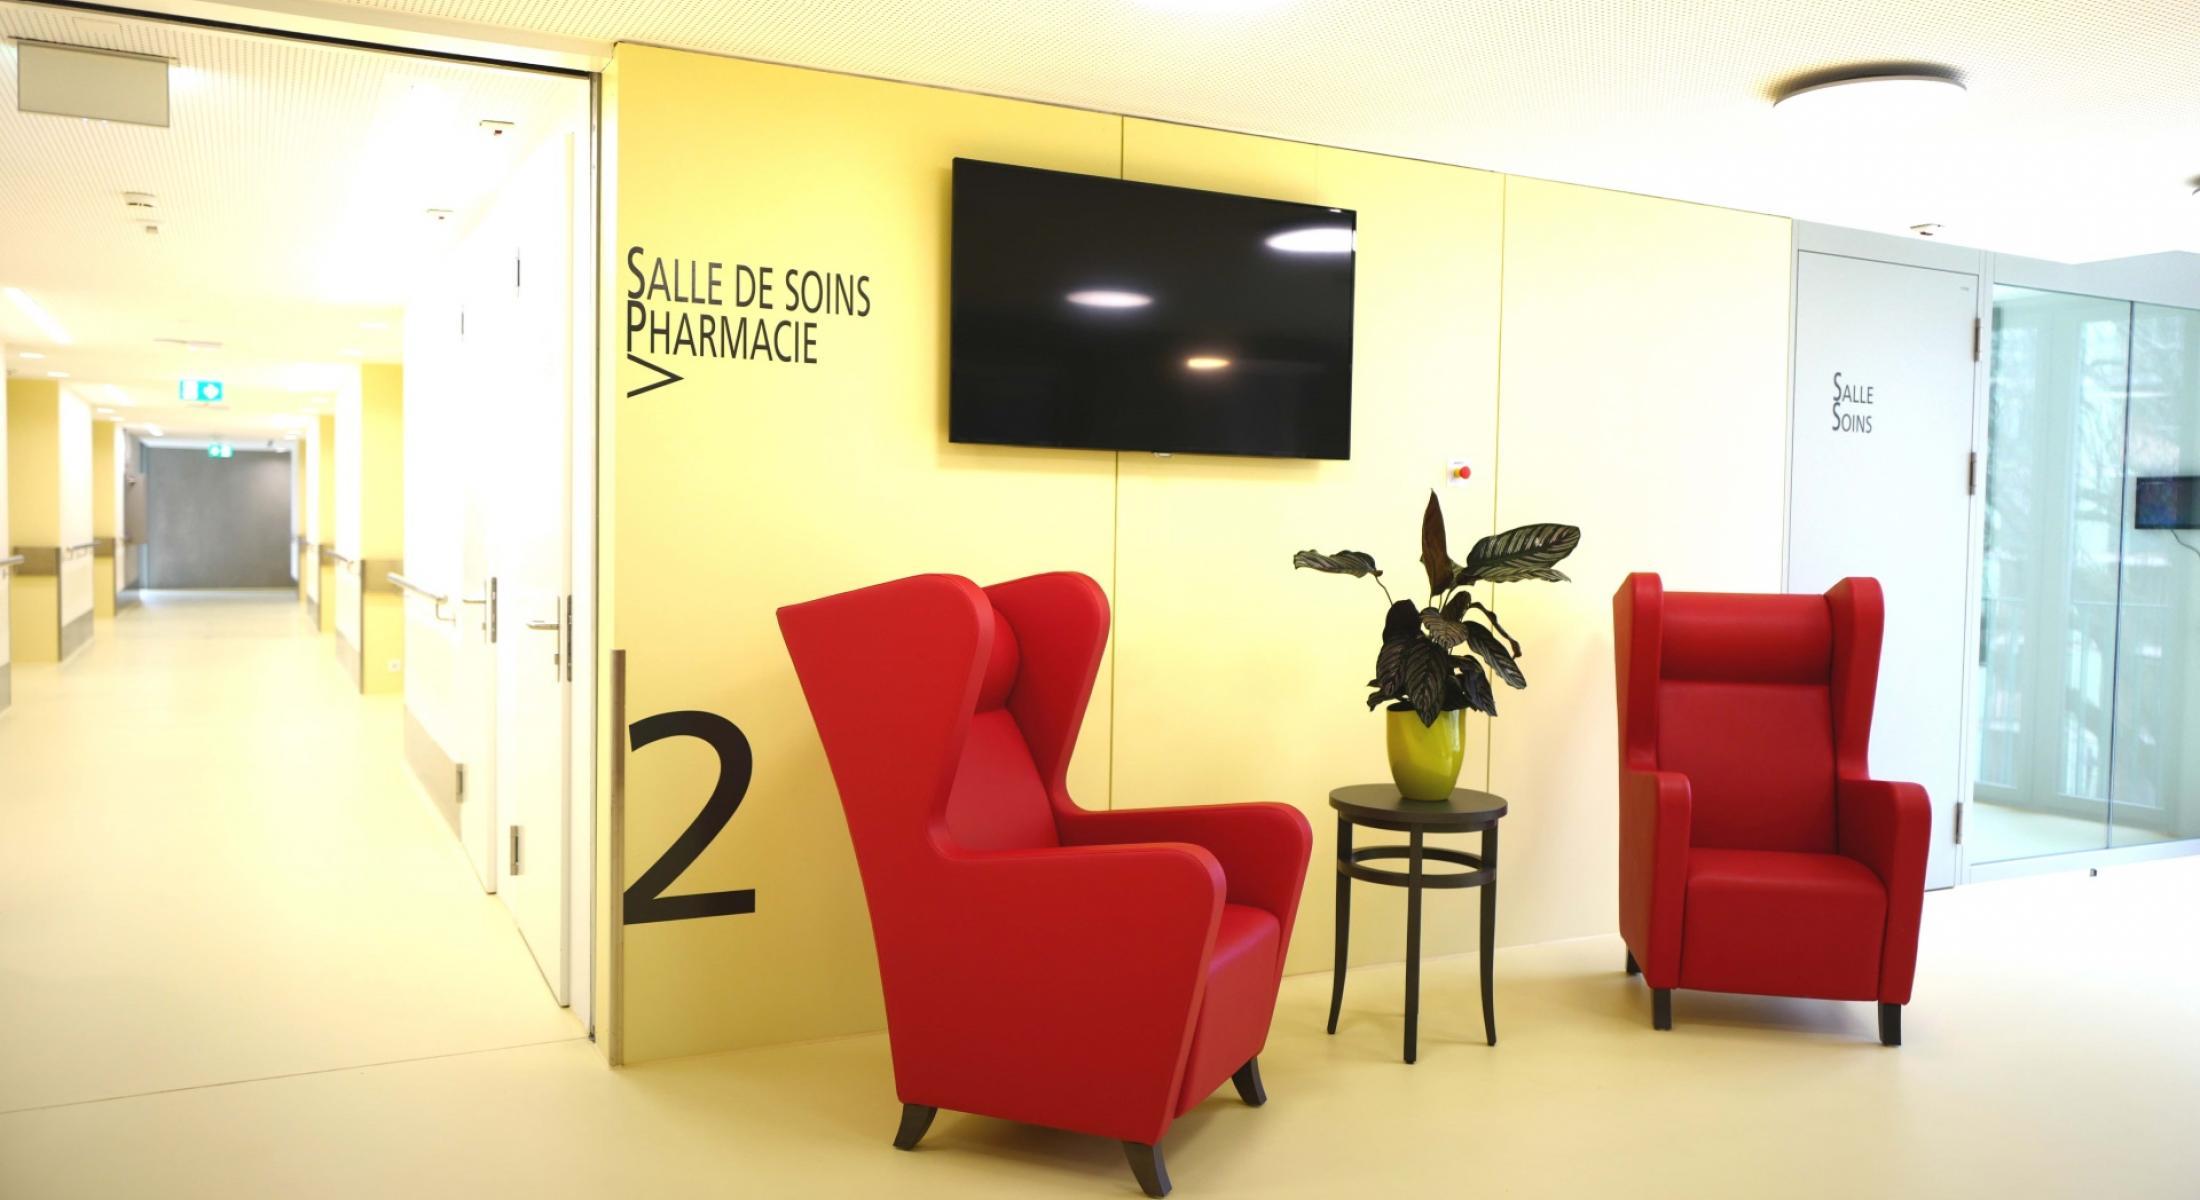 Creating Hospitality - EMS STELLA GENEVE 1 - Suisse _LR_23